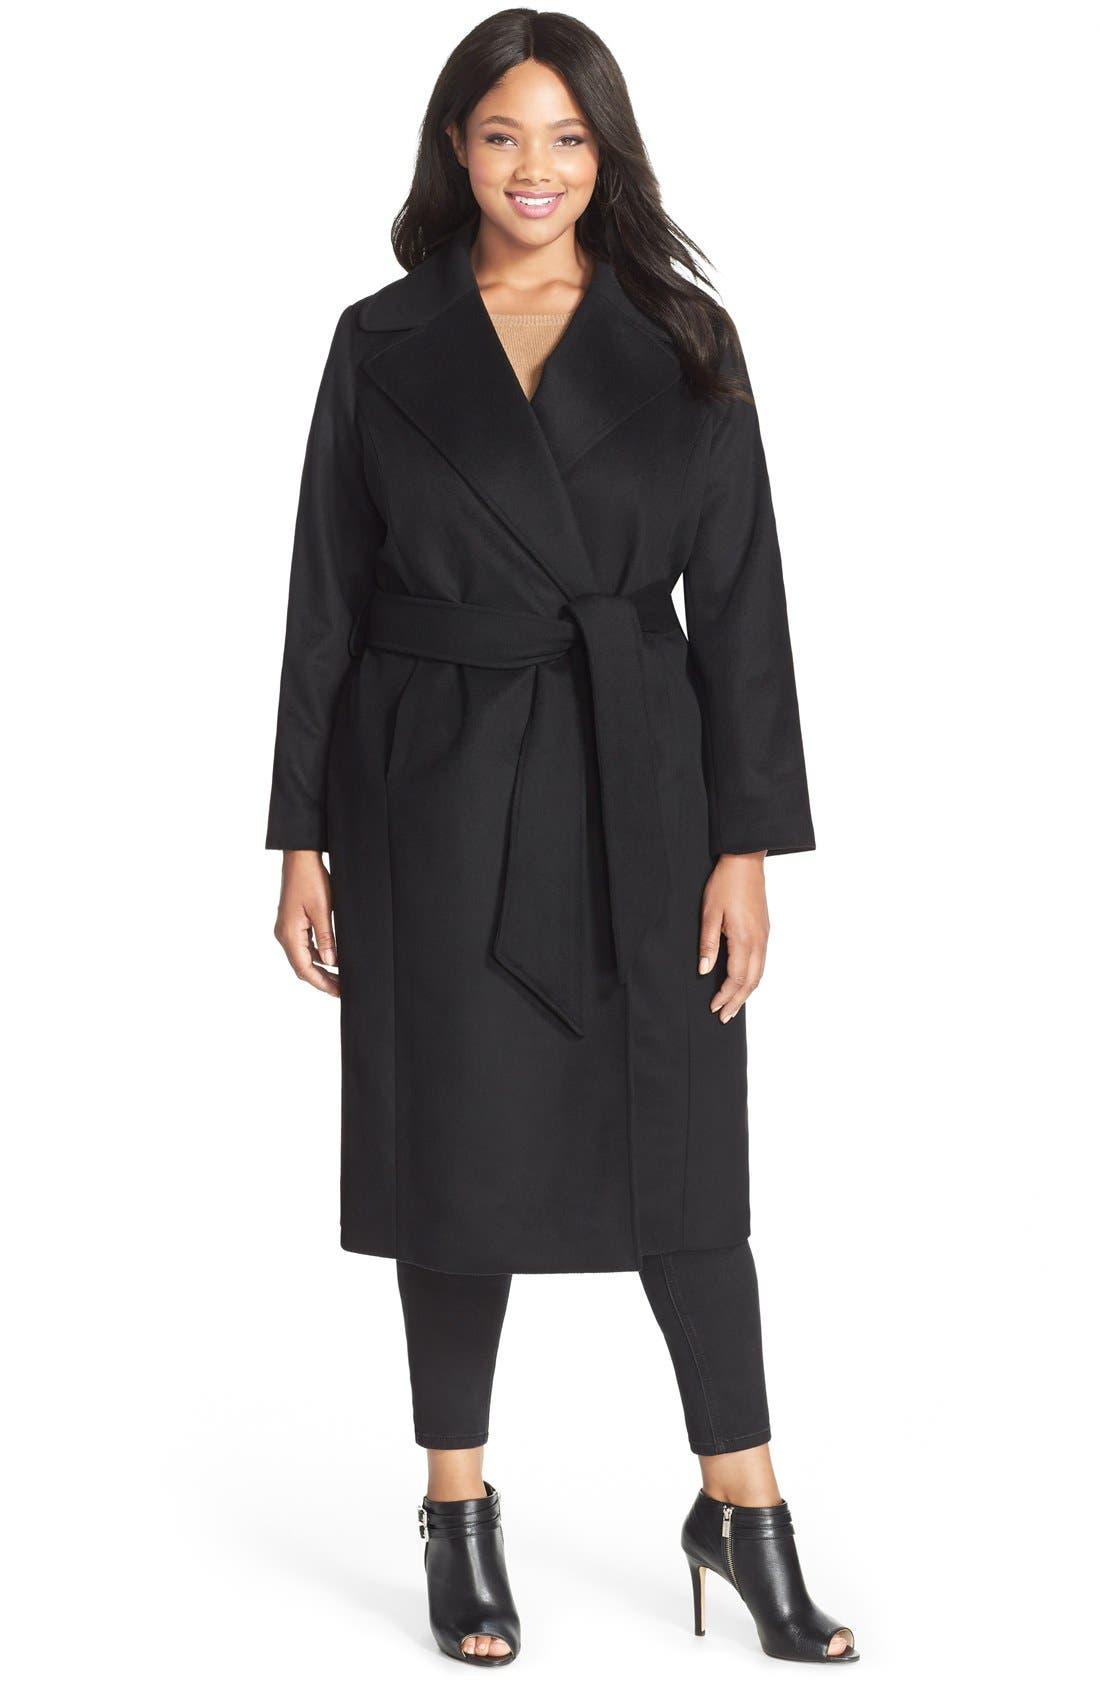 George SimontonCouture 'Hollywood' Long Wrap Coat (Plus Size)